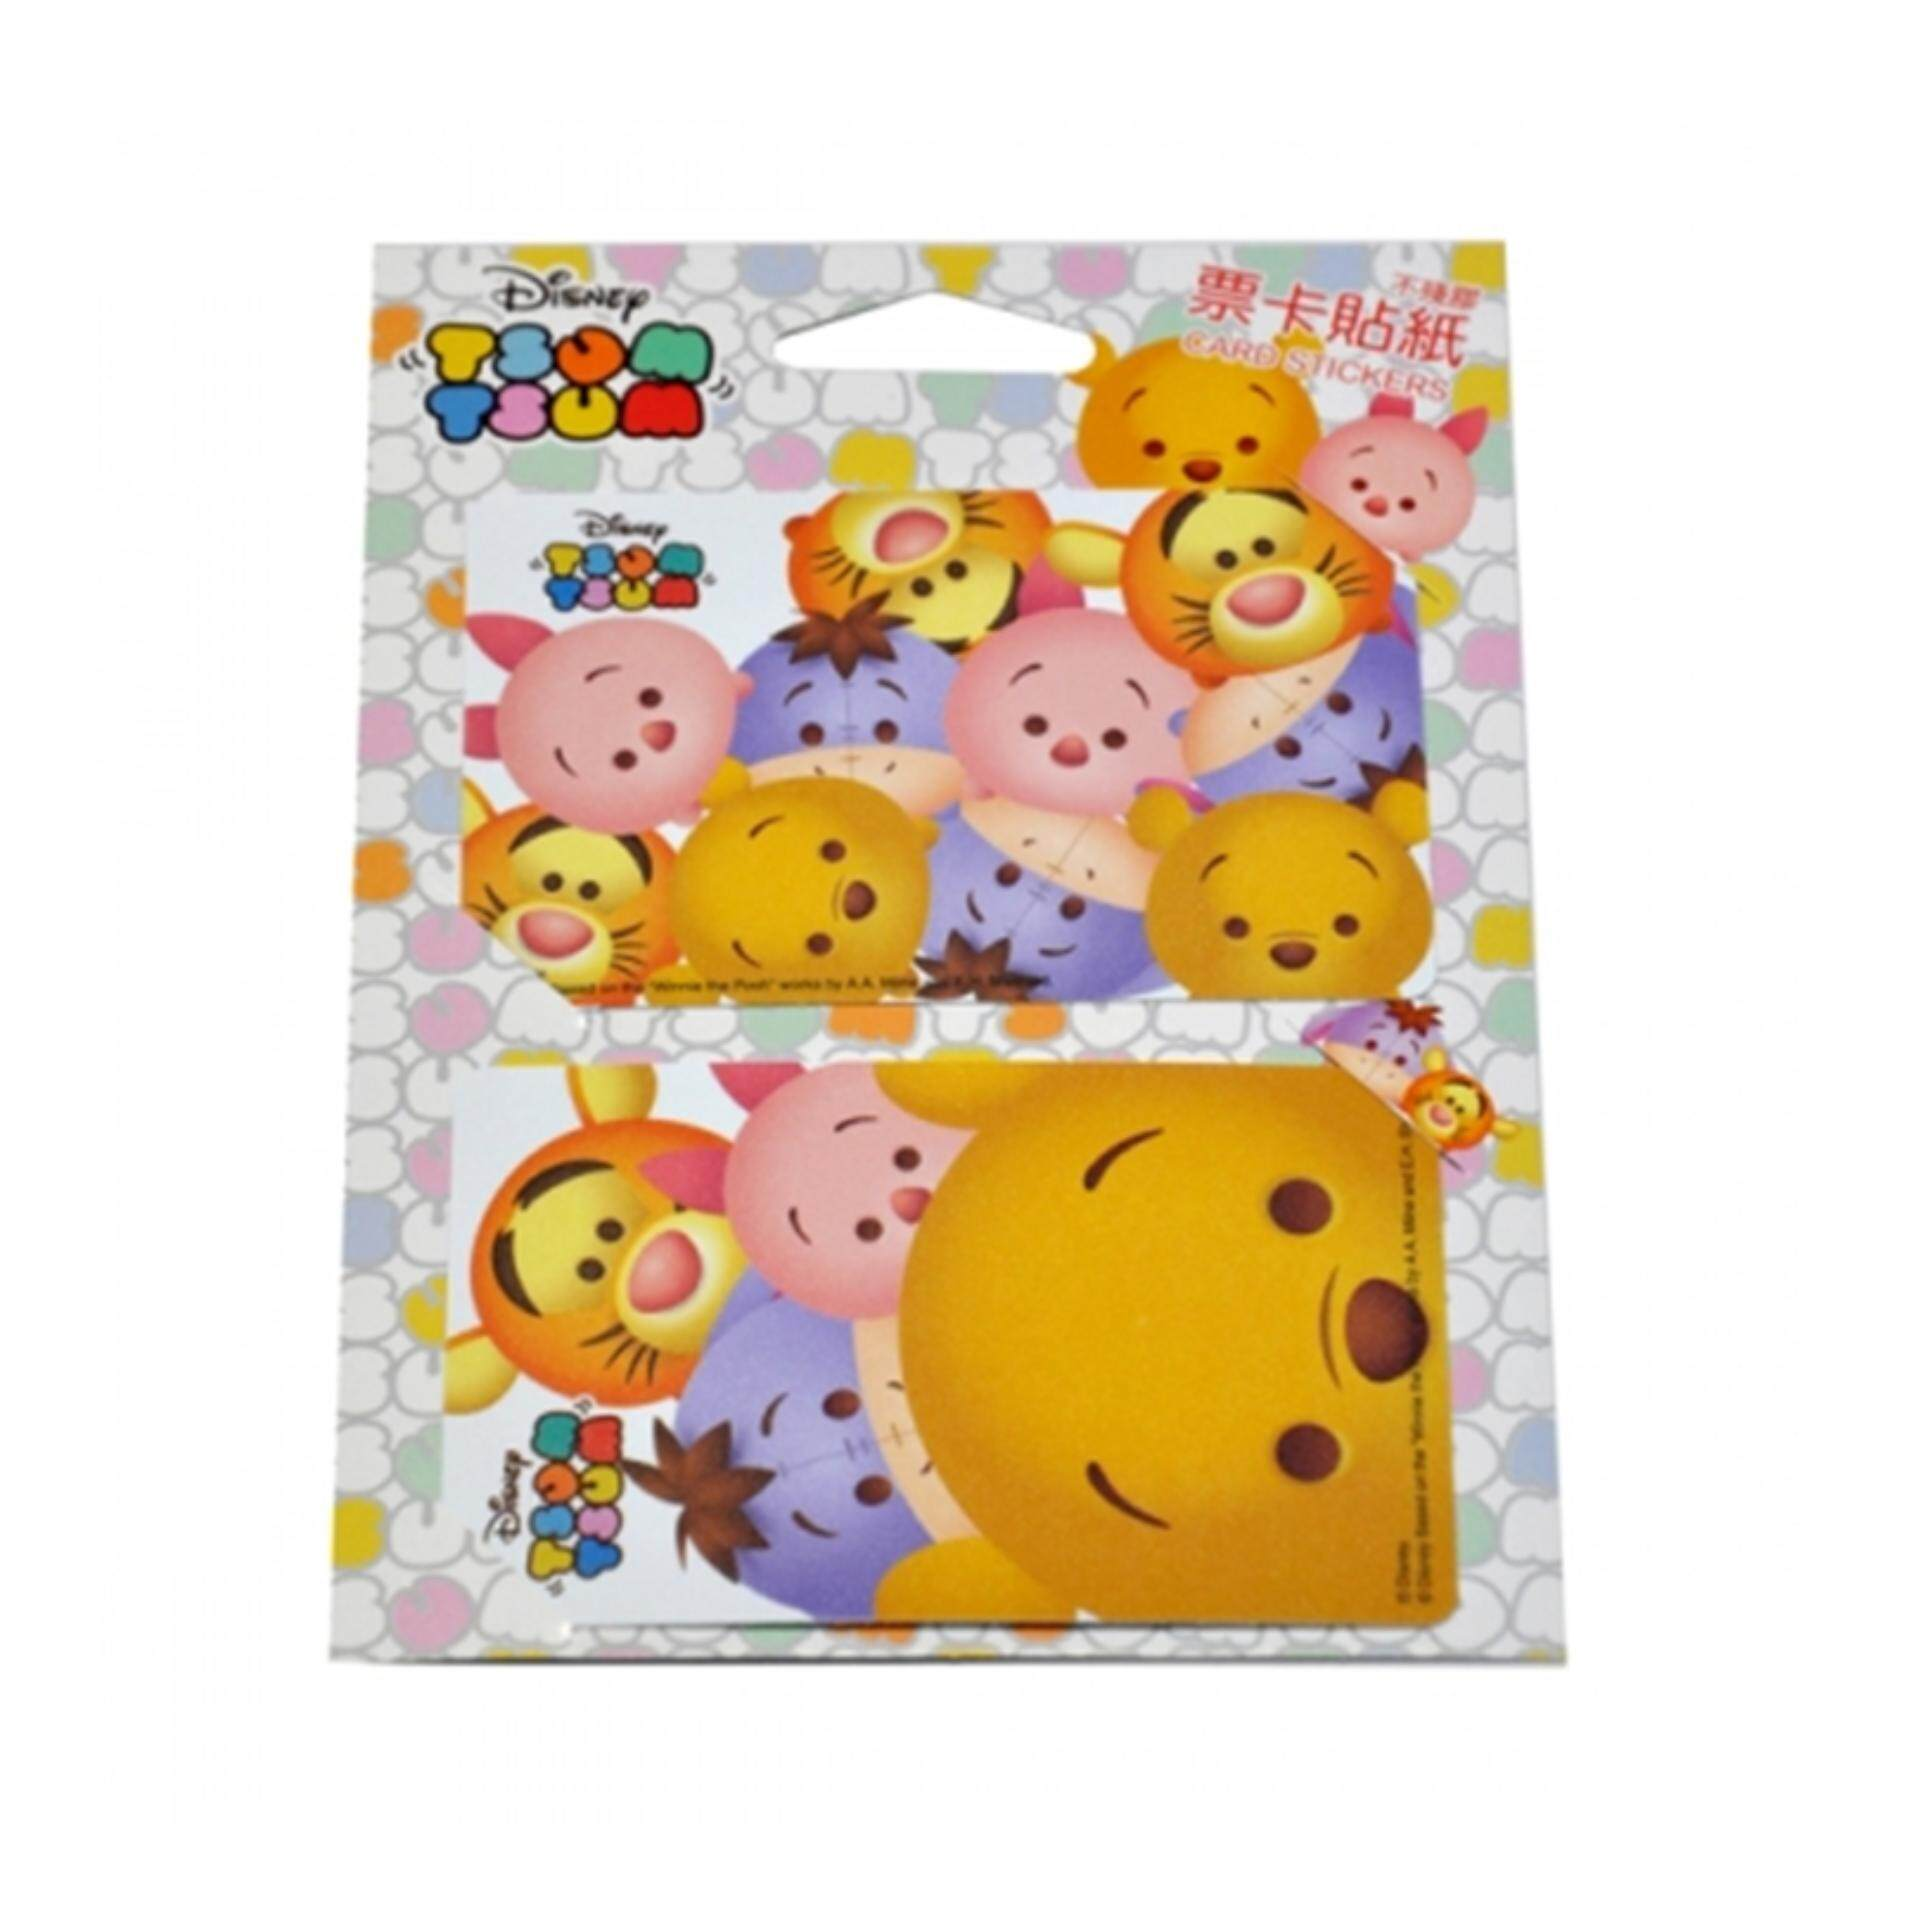 Disney Tsum Tsum 2's Card Sticker - Winnie The Pooh